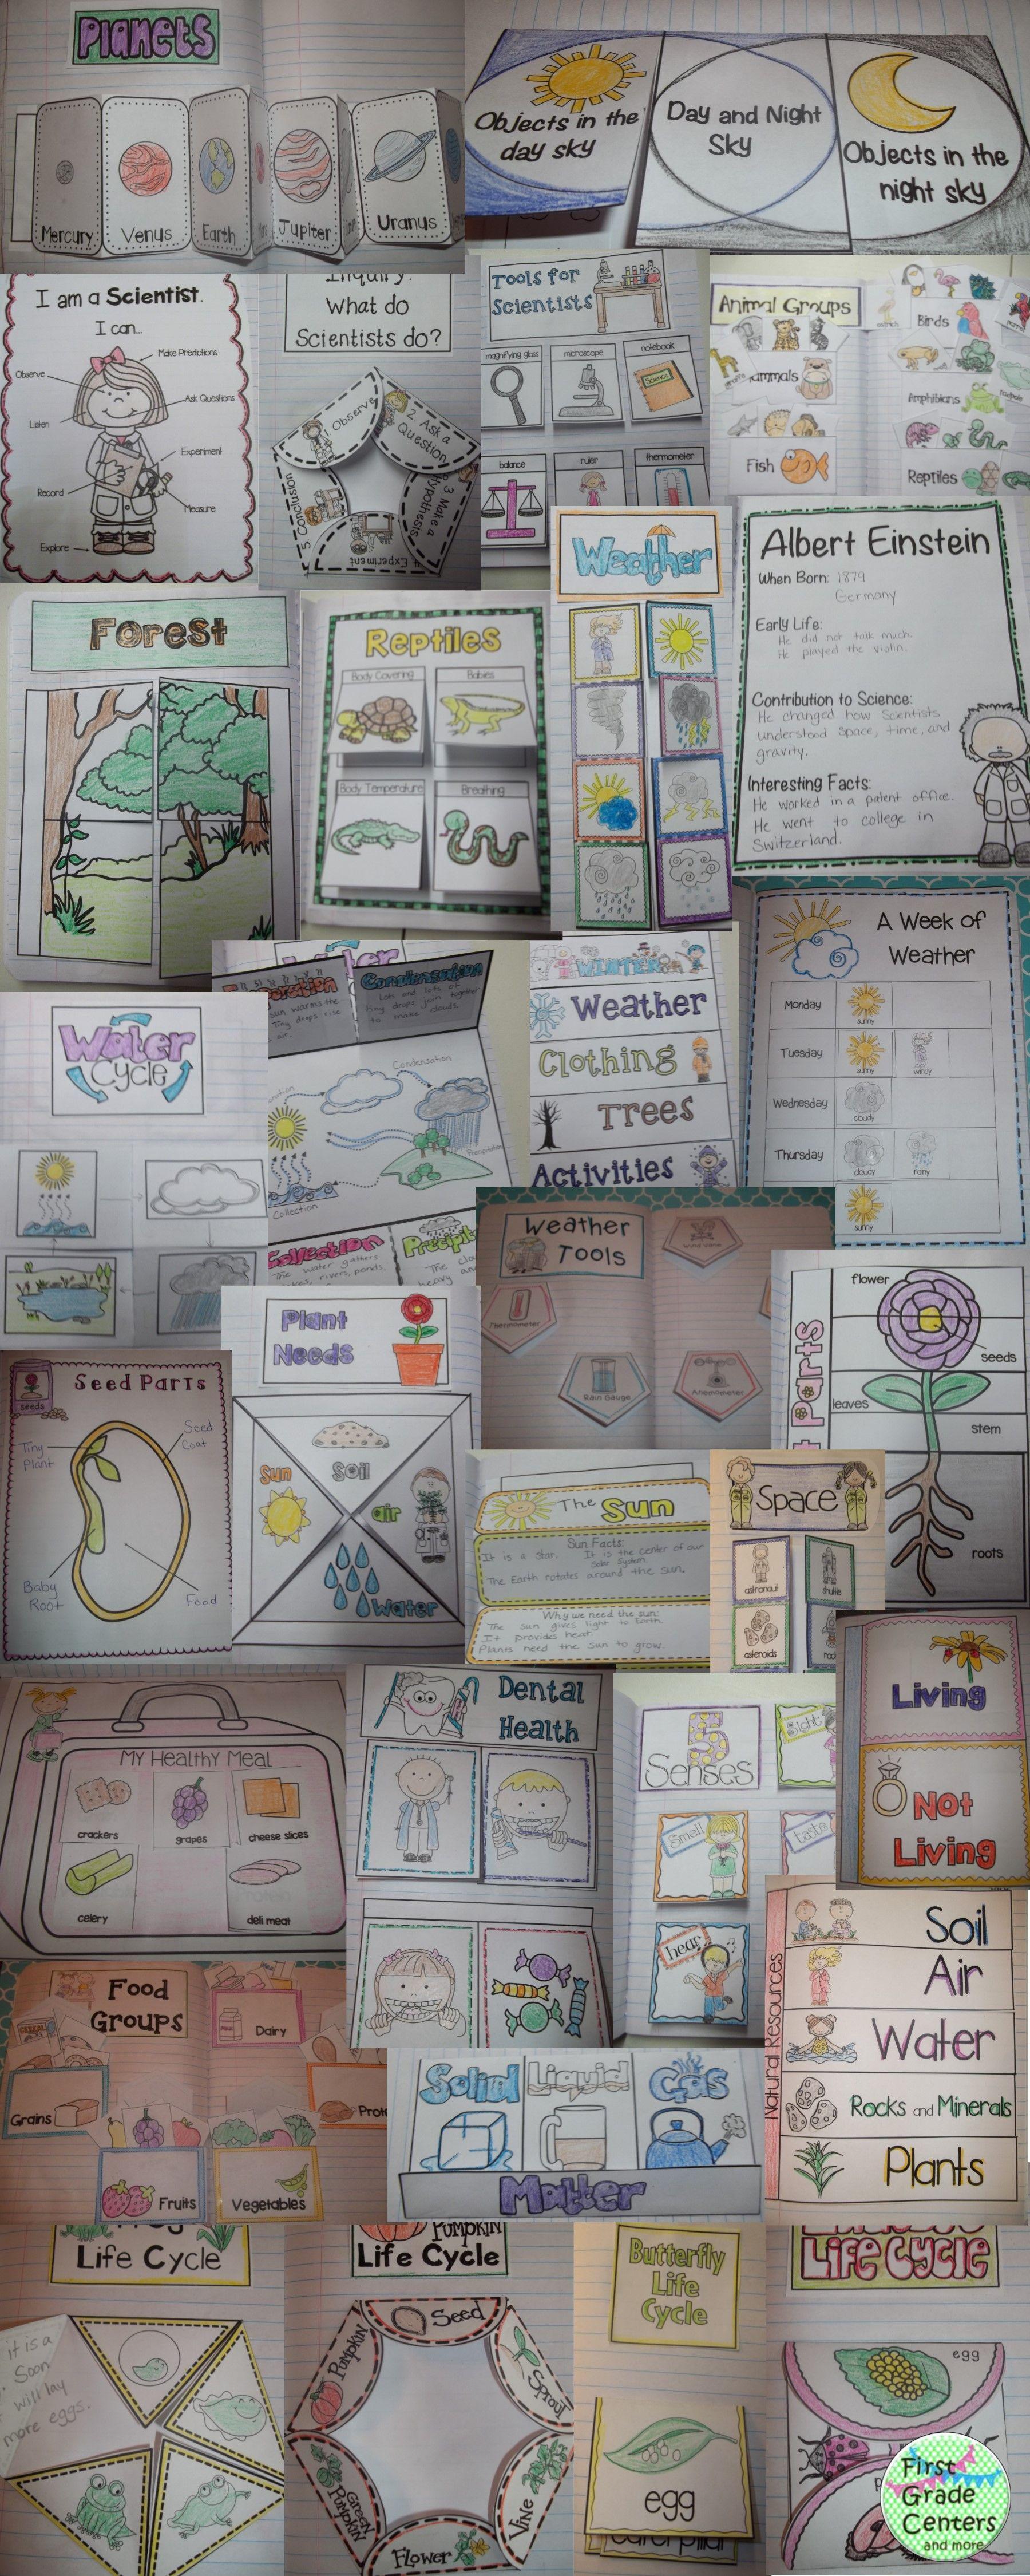 Interactive Science Notebook K 2 Covers So Many Topics Five Senses Animal Groups Habitats